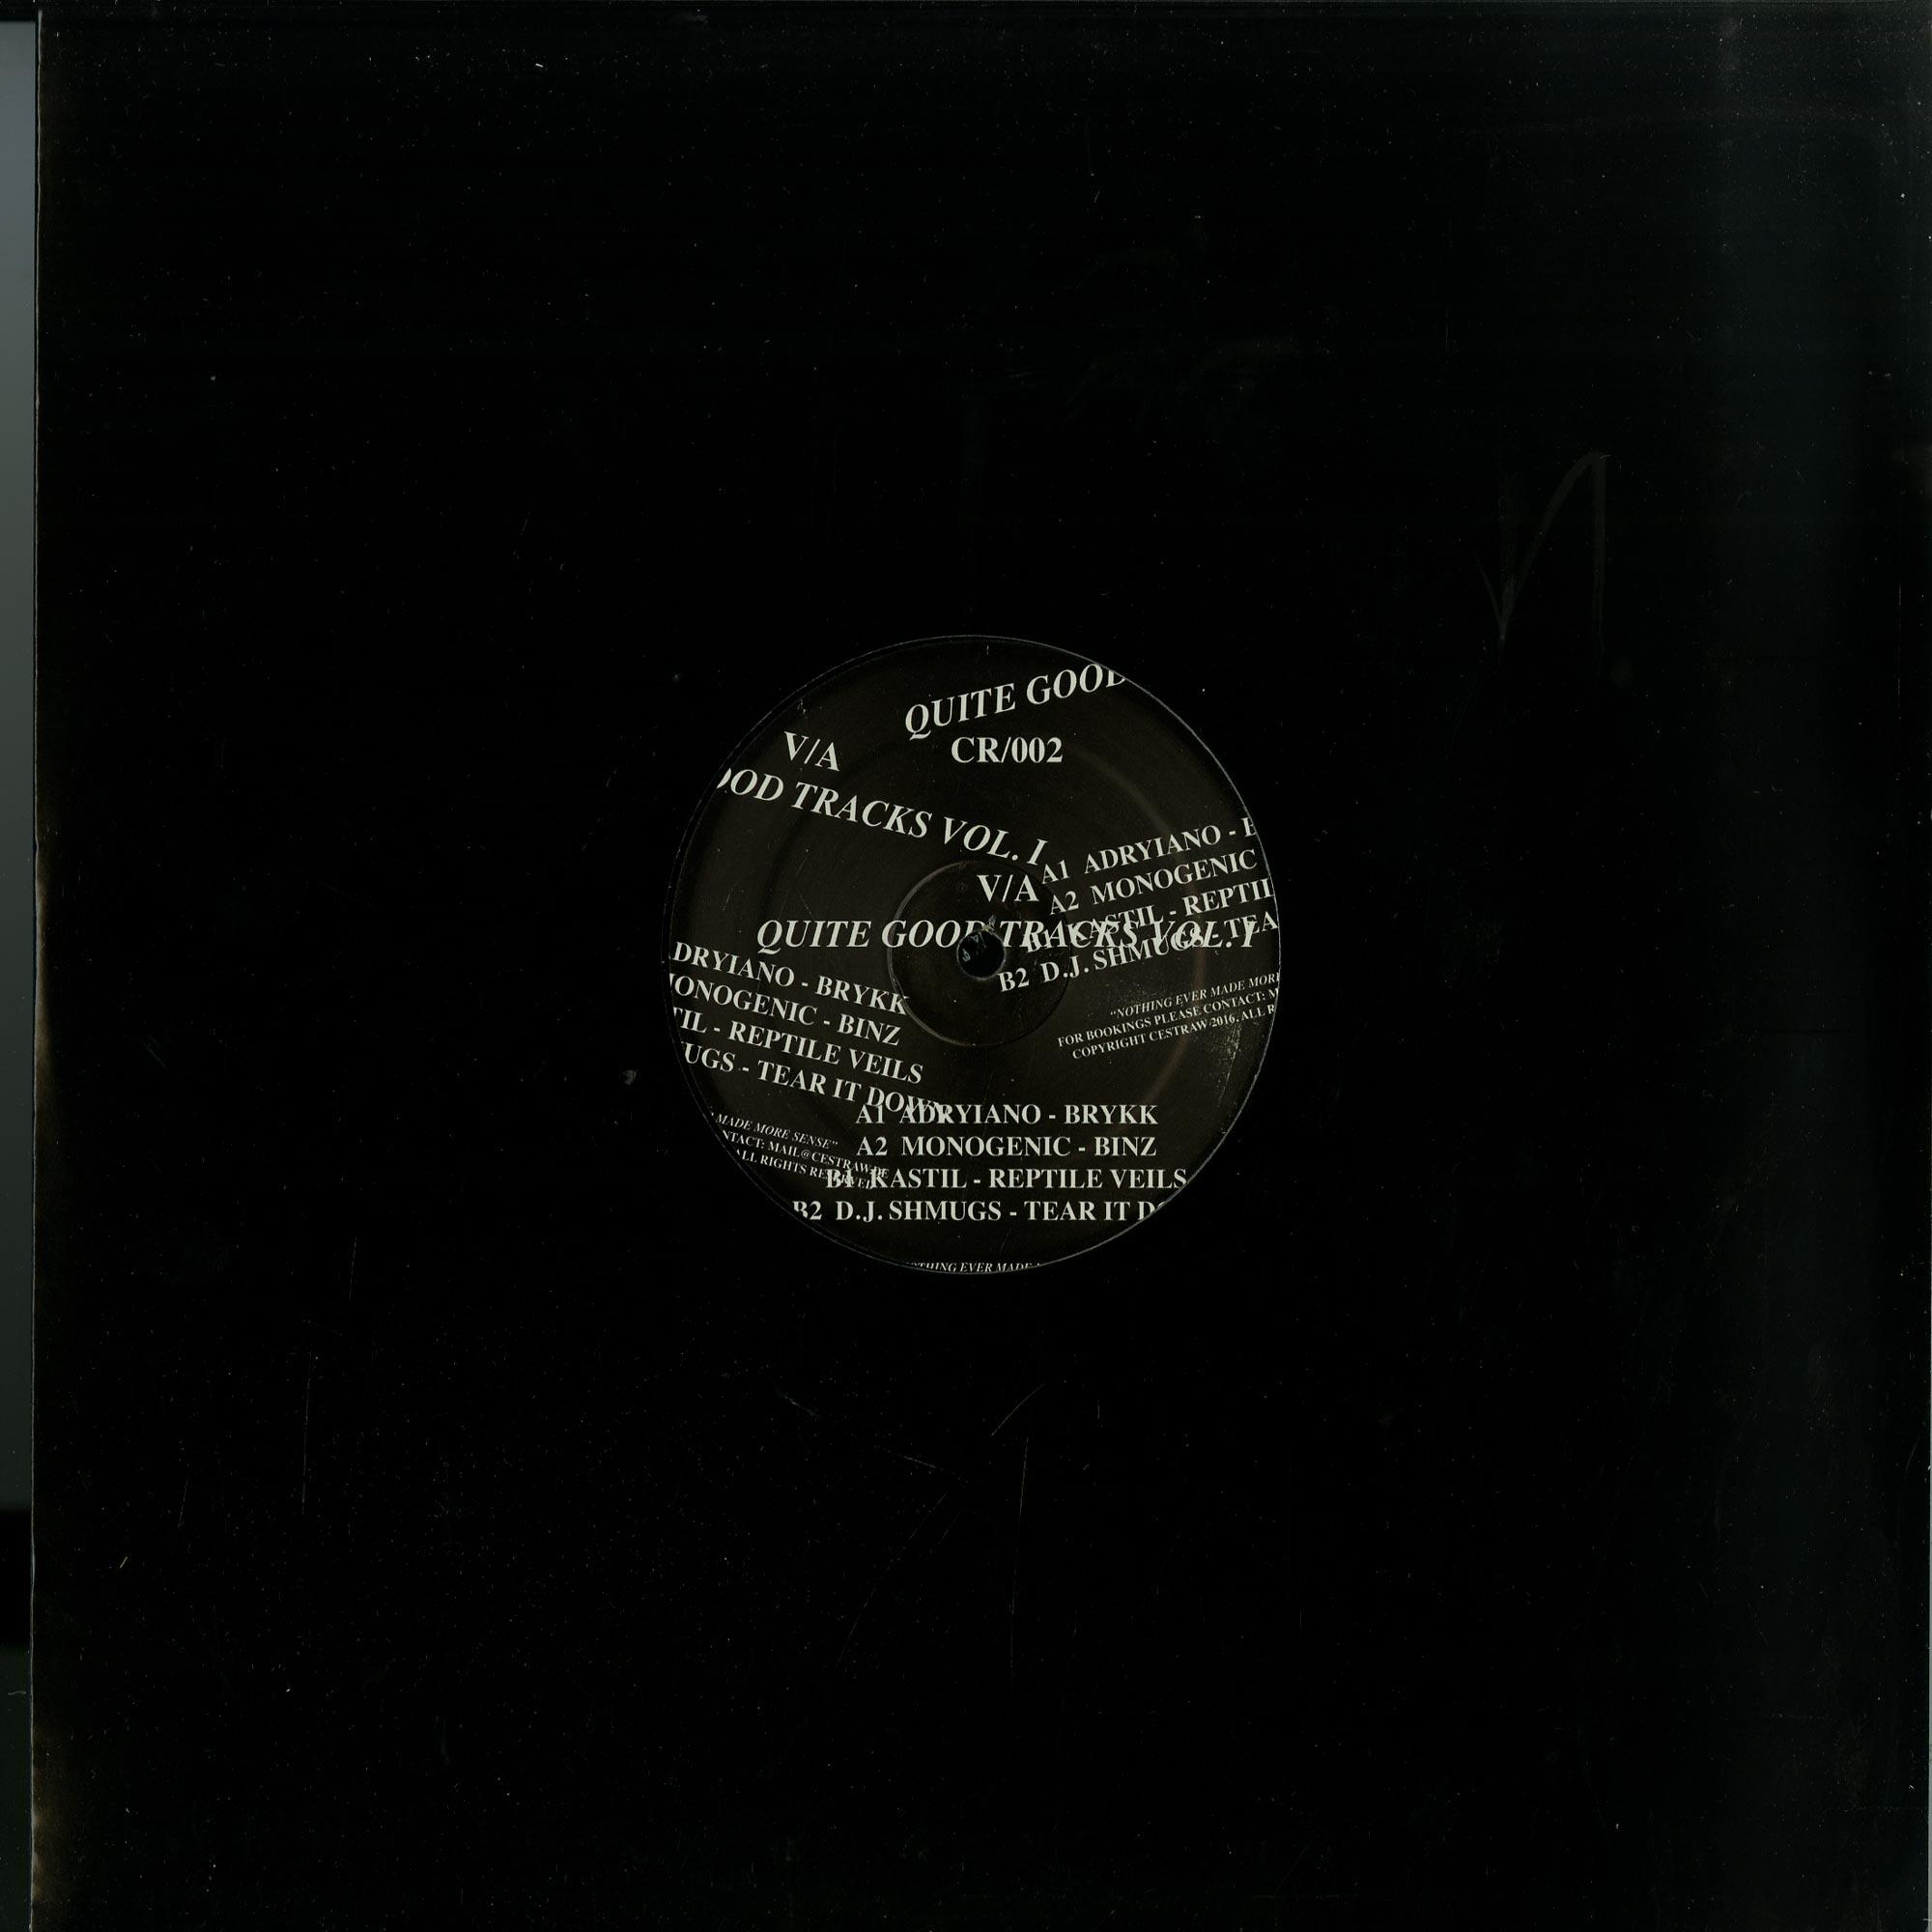 Various Artists - QUITE GOOD TRACKS VOL. 1